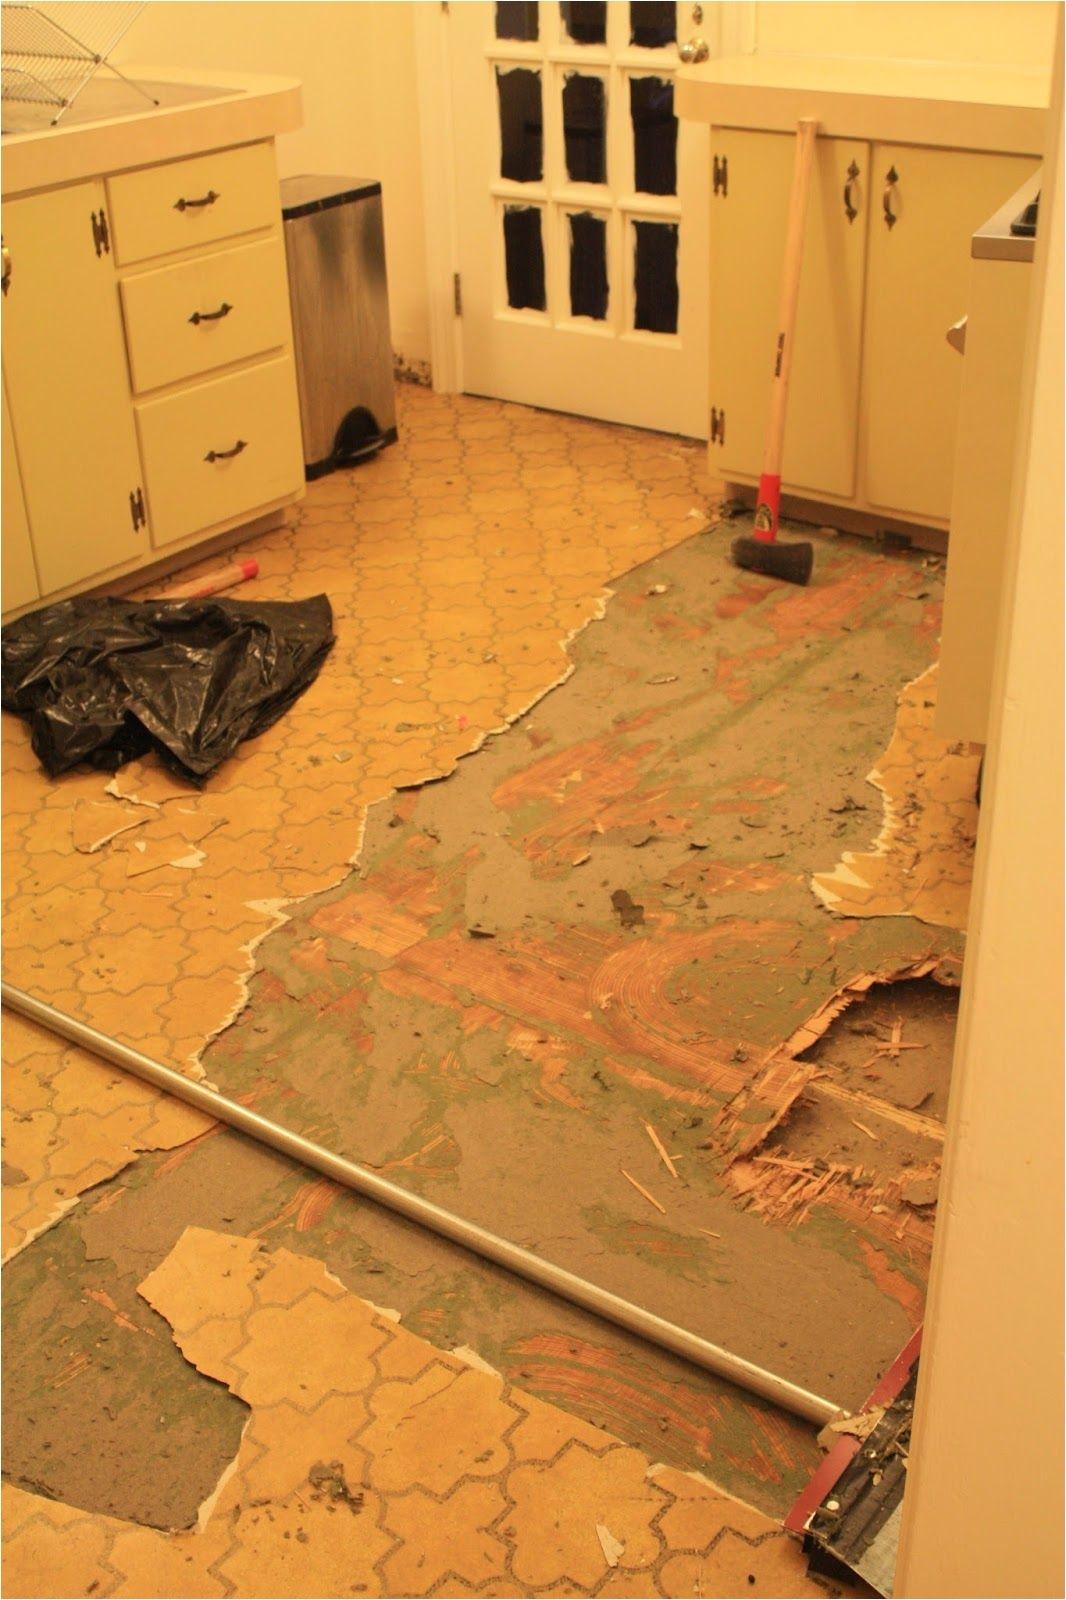 removing linoleum scraping up linoleum restoring wood floors ripping up linoleum